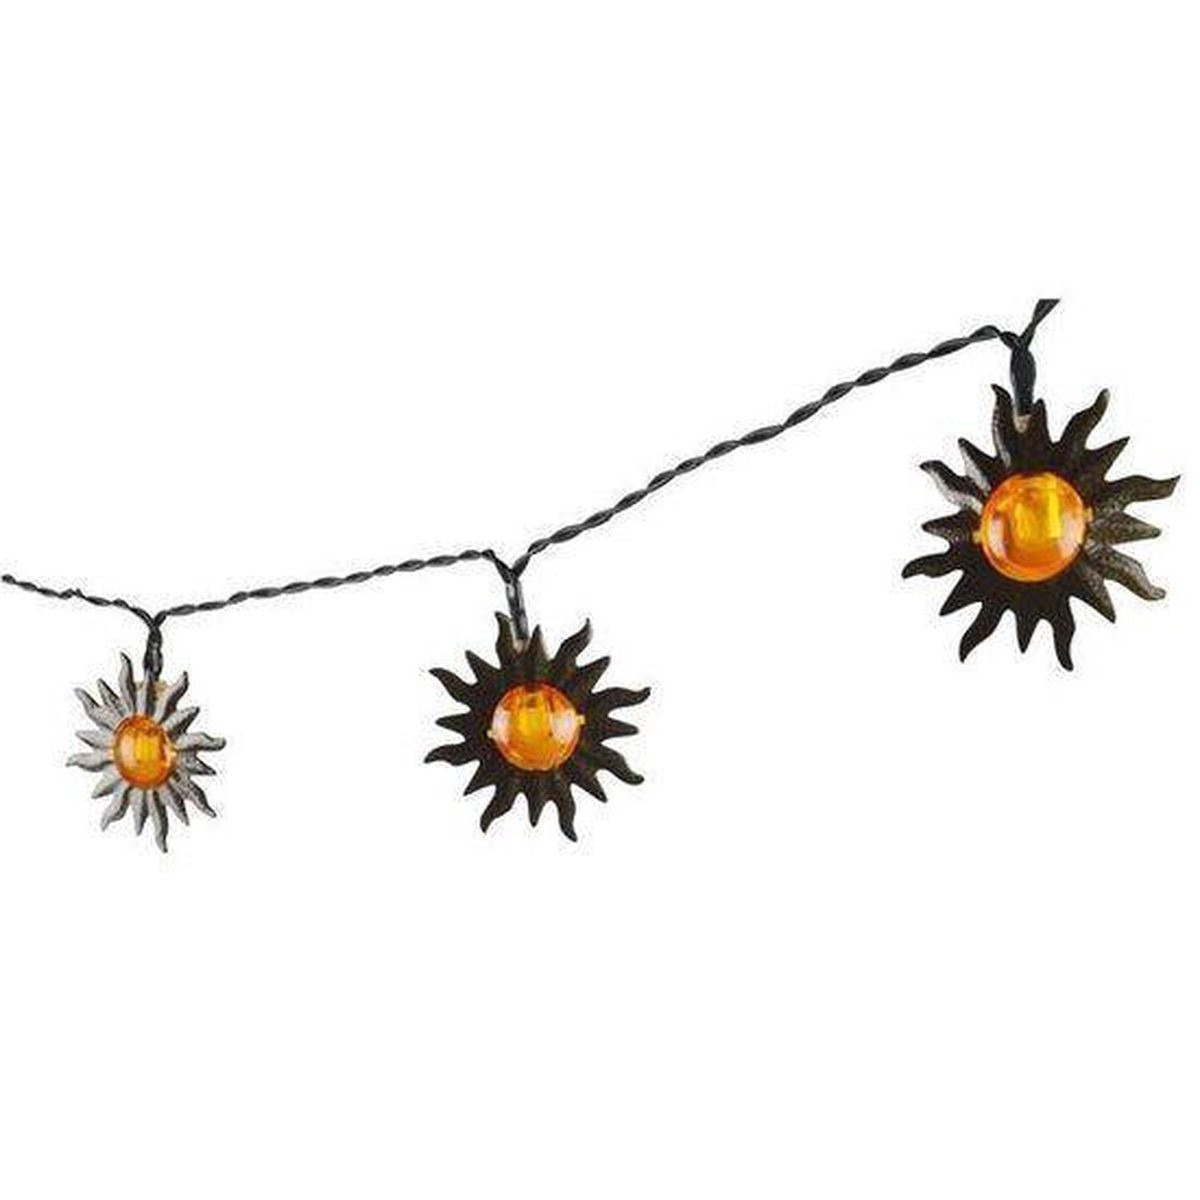 1x Solar lichtslinger met zonnetjes op zonne-energie 365 cm tuinverlichting - Buitenverlichting